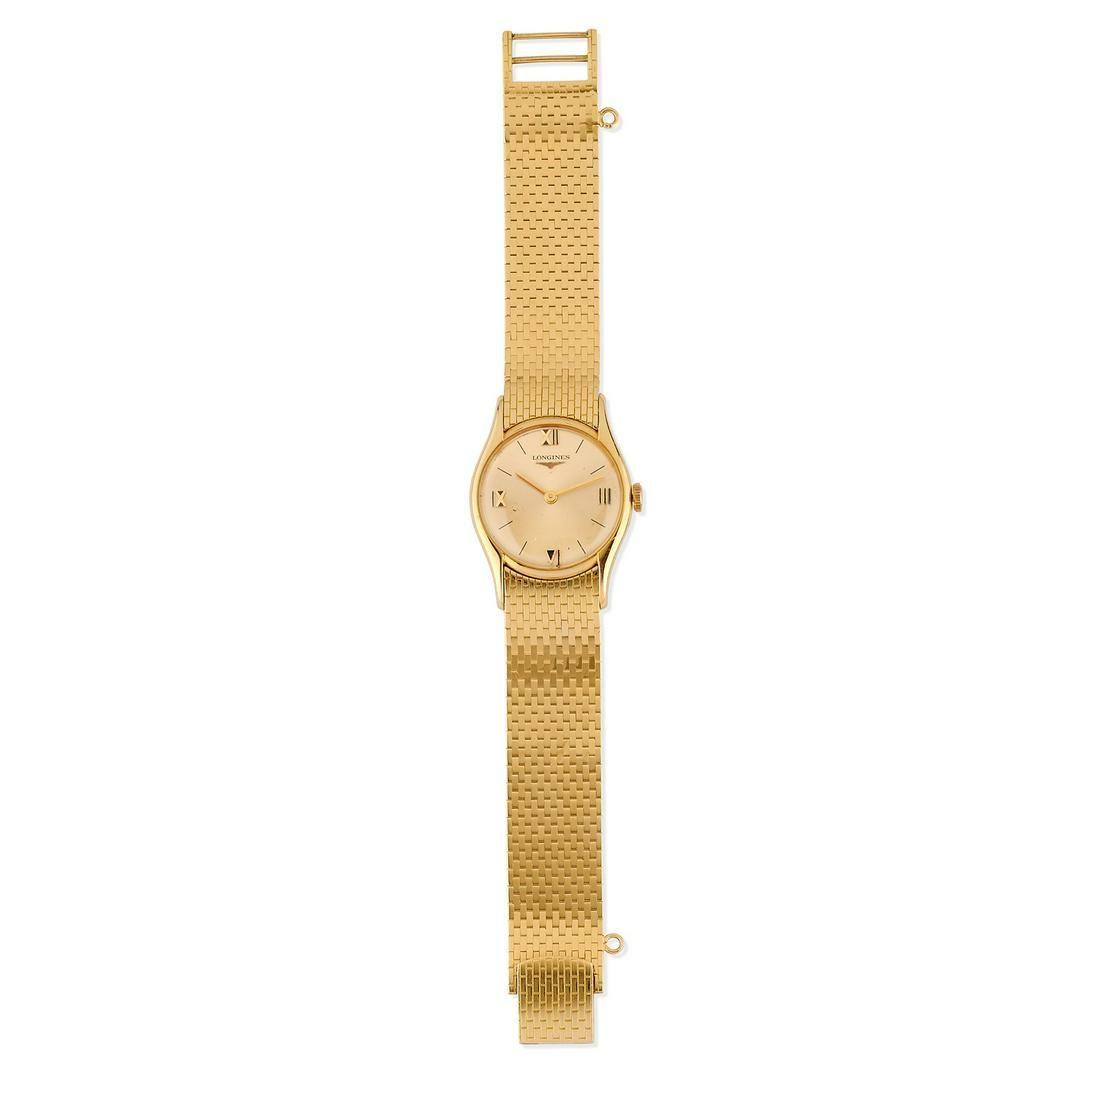 Longines - A 18K yellow gold wristwatch, Longines